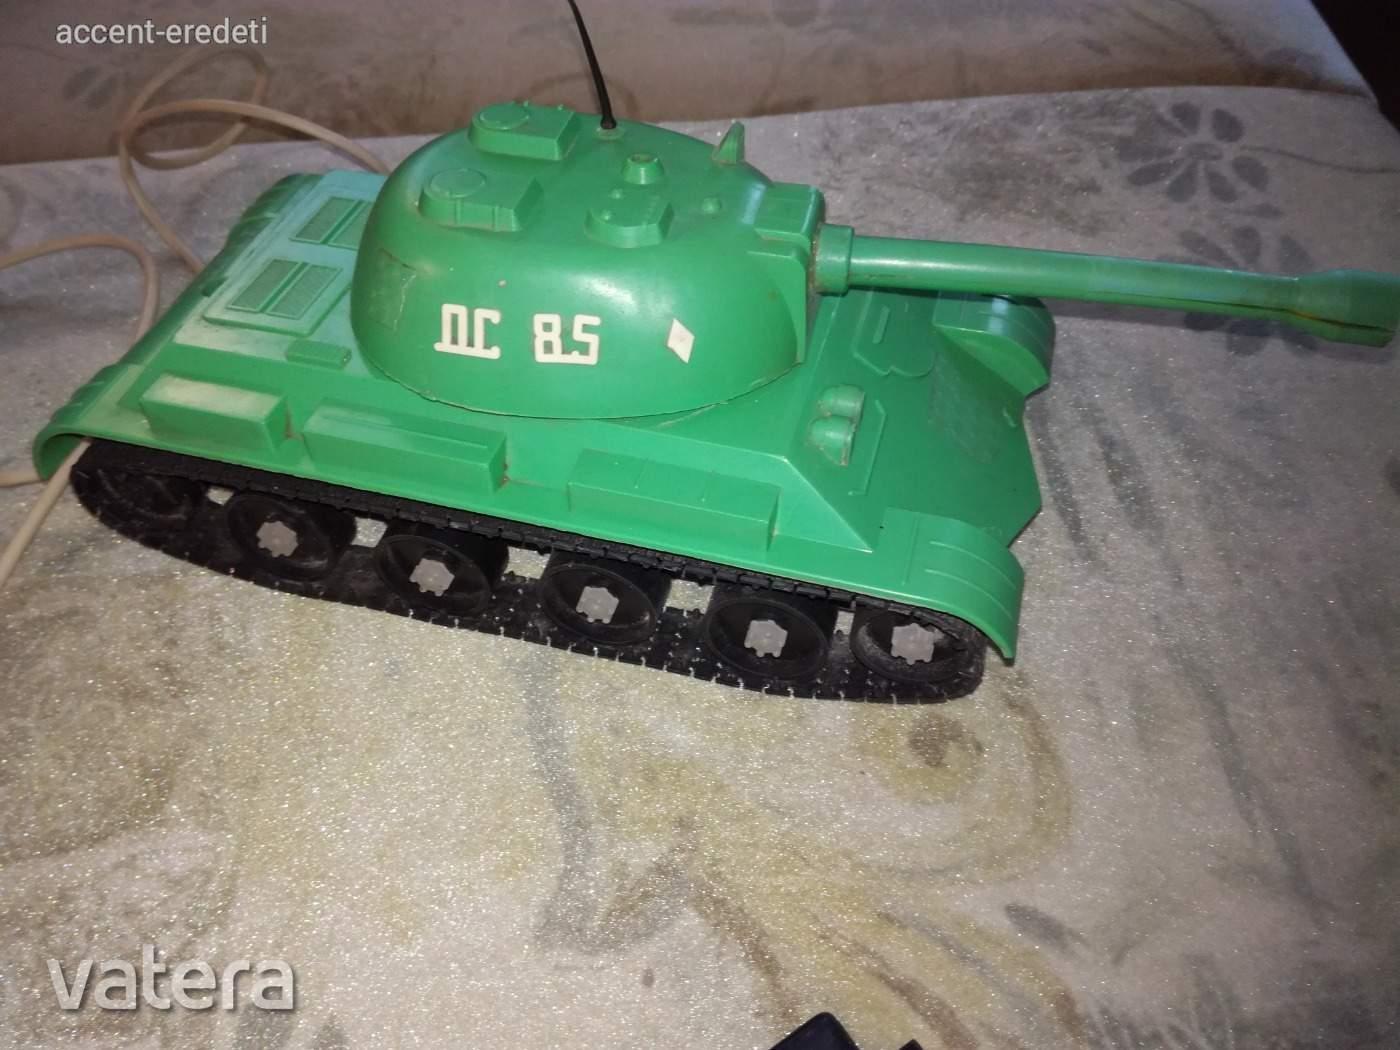 oc-85-taviranyitos-szovjet-muanyag-tank-fdfa_6_big.jpg